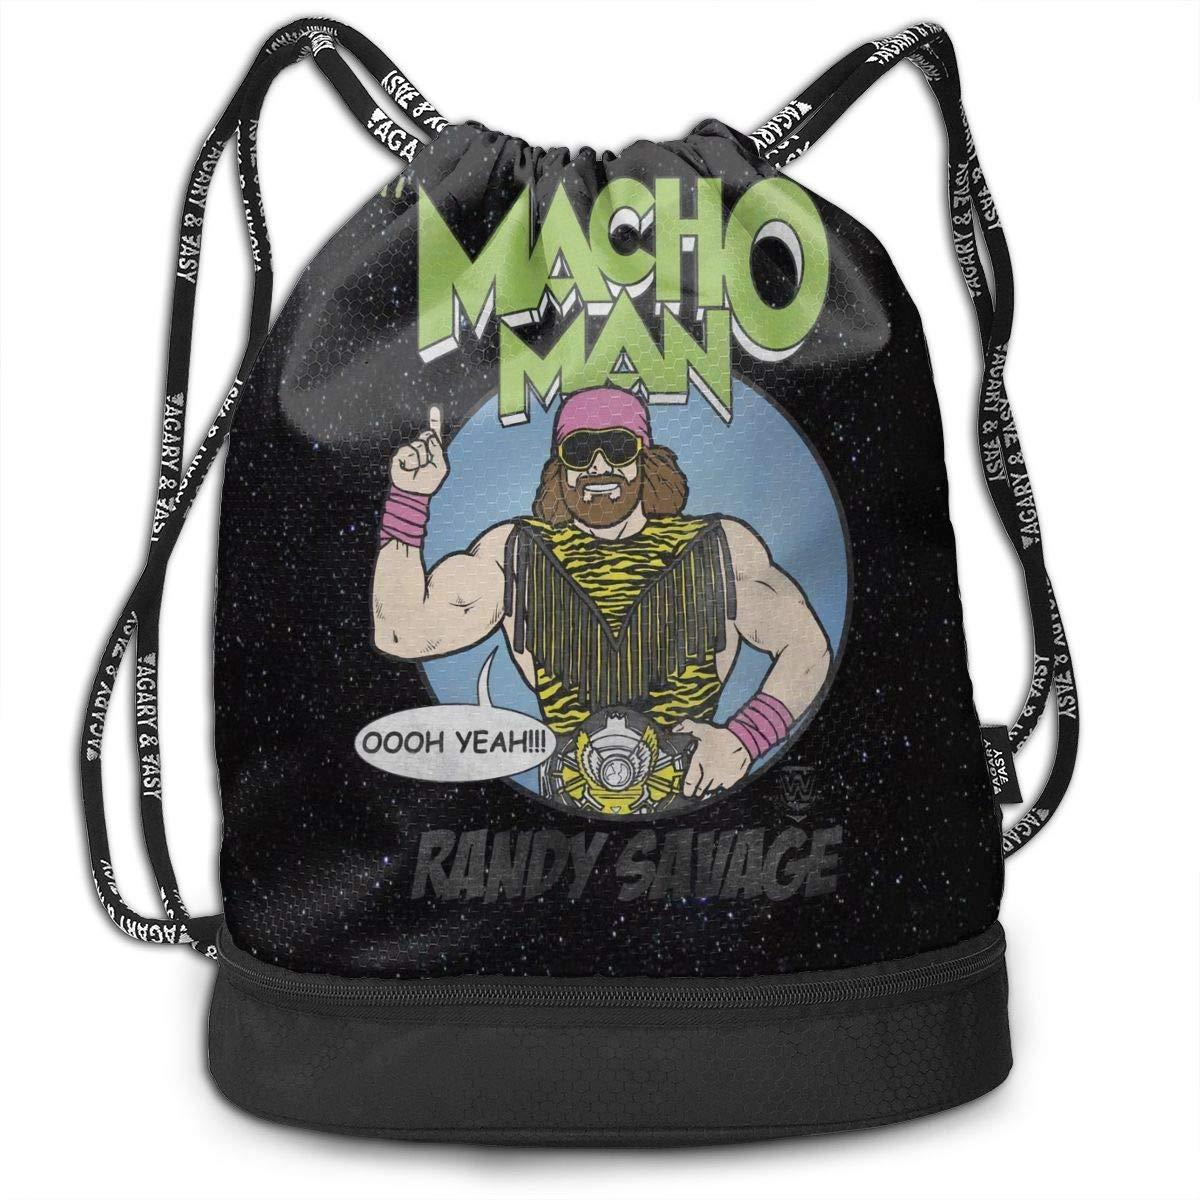 Xdfcvmalkwrj Unisex Man Womens Macho Man Durable Beam Backpack Gift